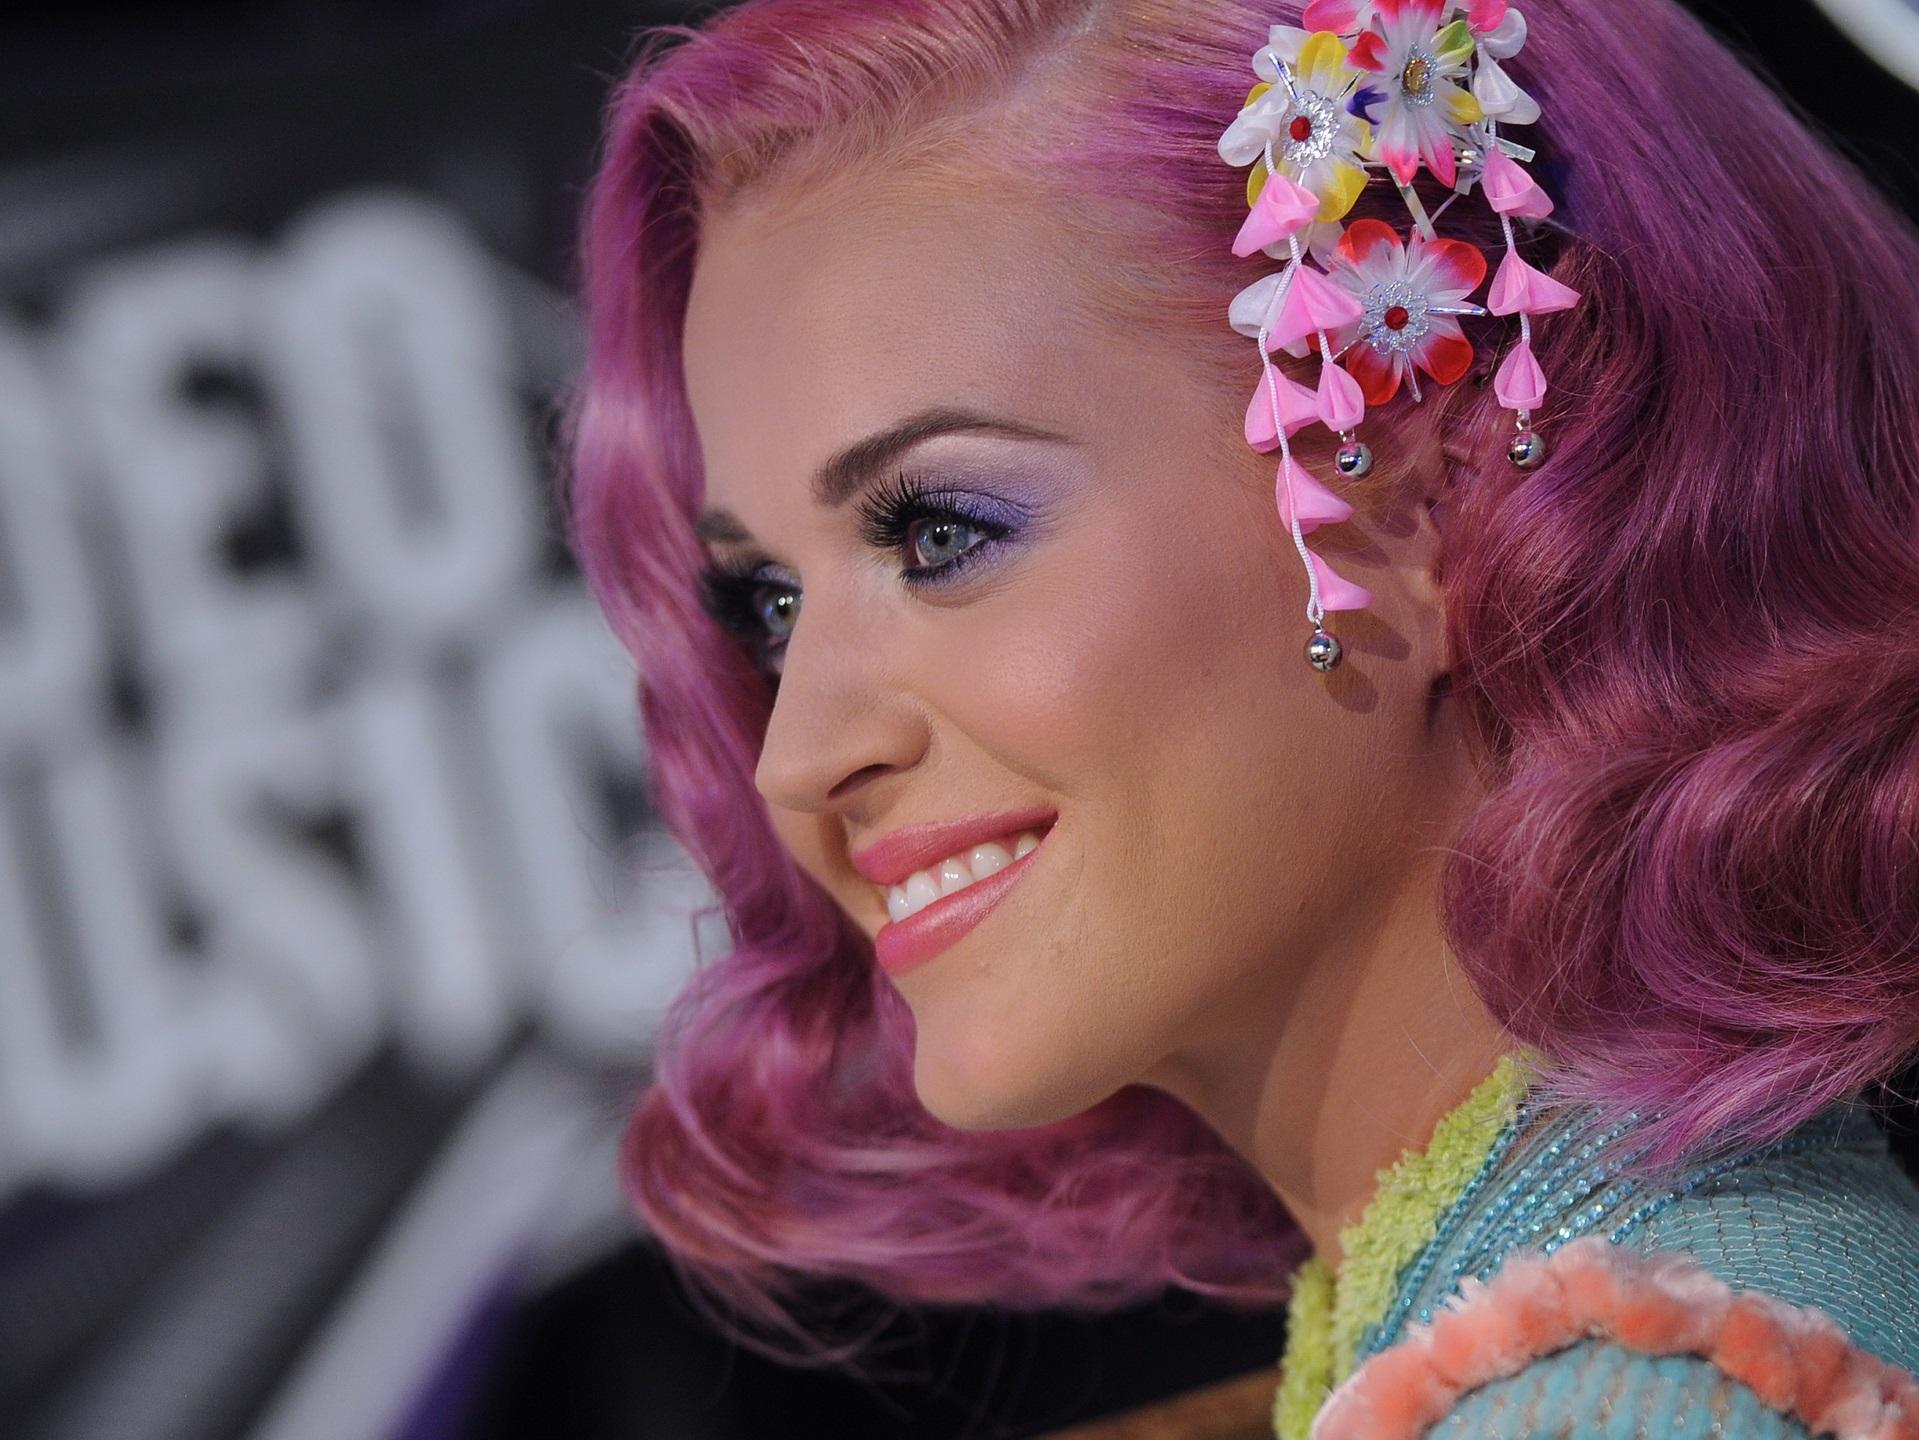 Katy Perry Wallpaper 38